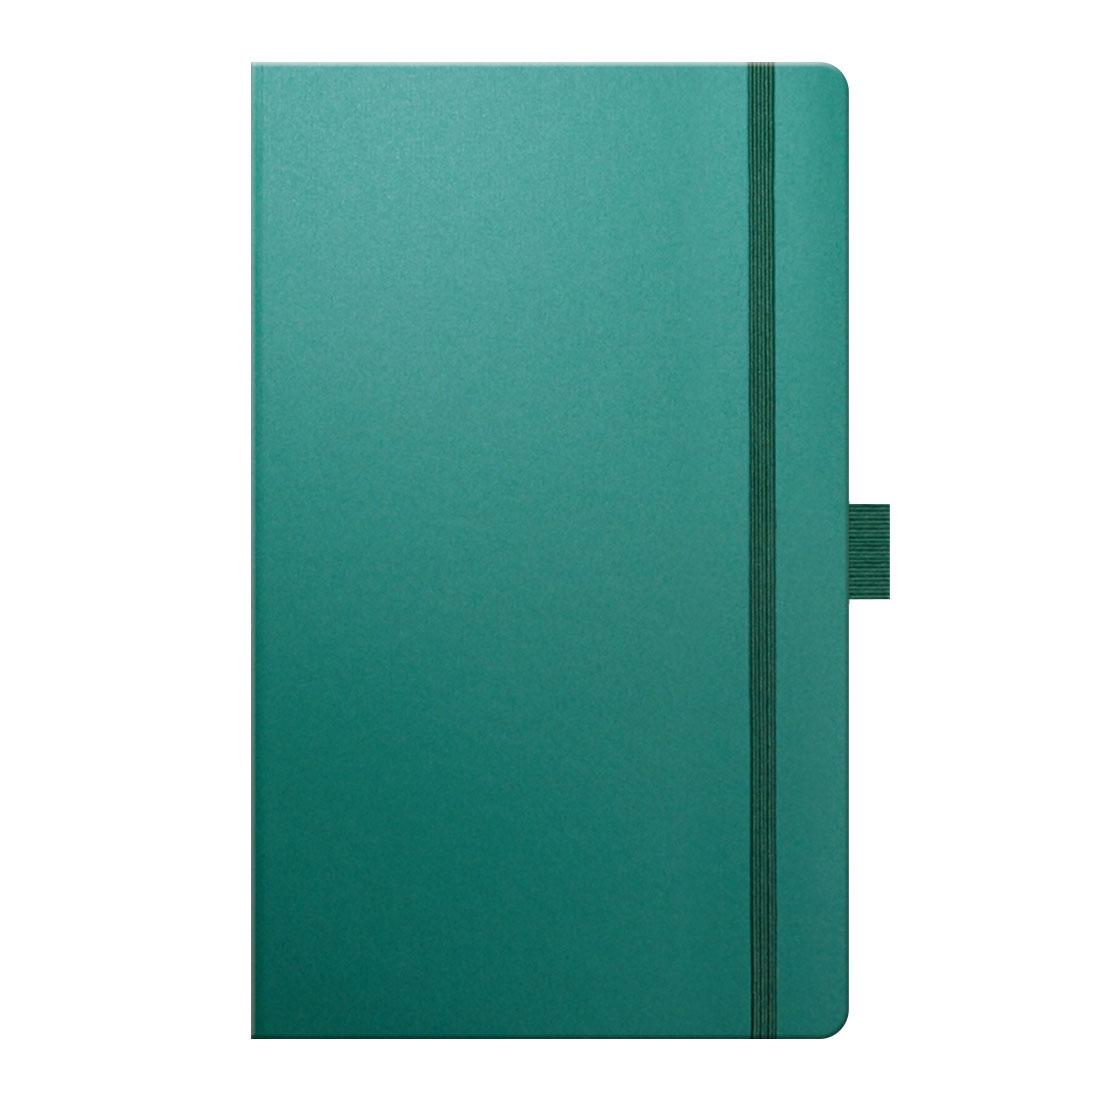 Castelli  Notebooks  Castelli Matra